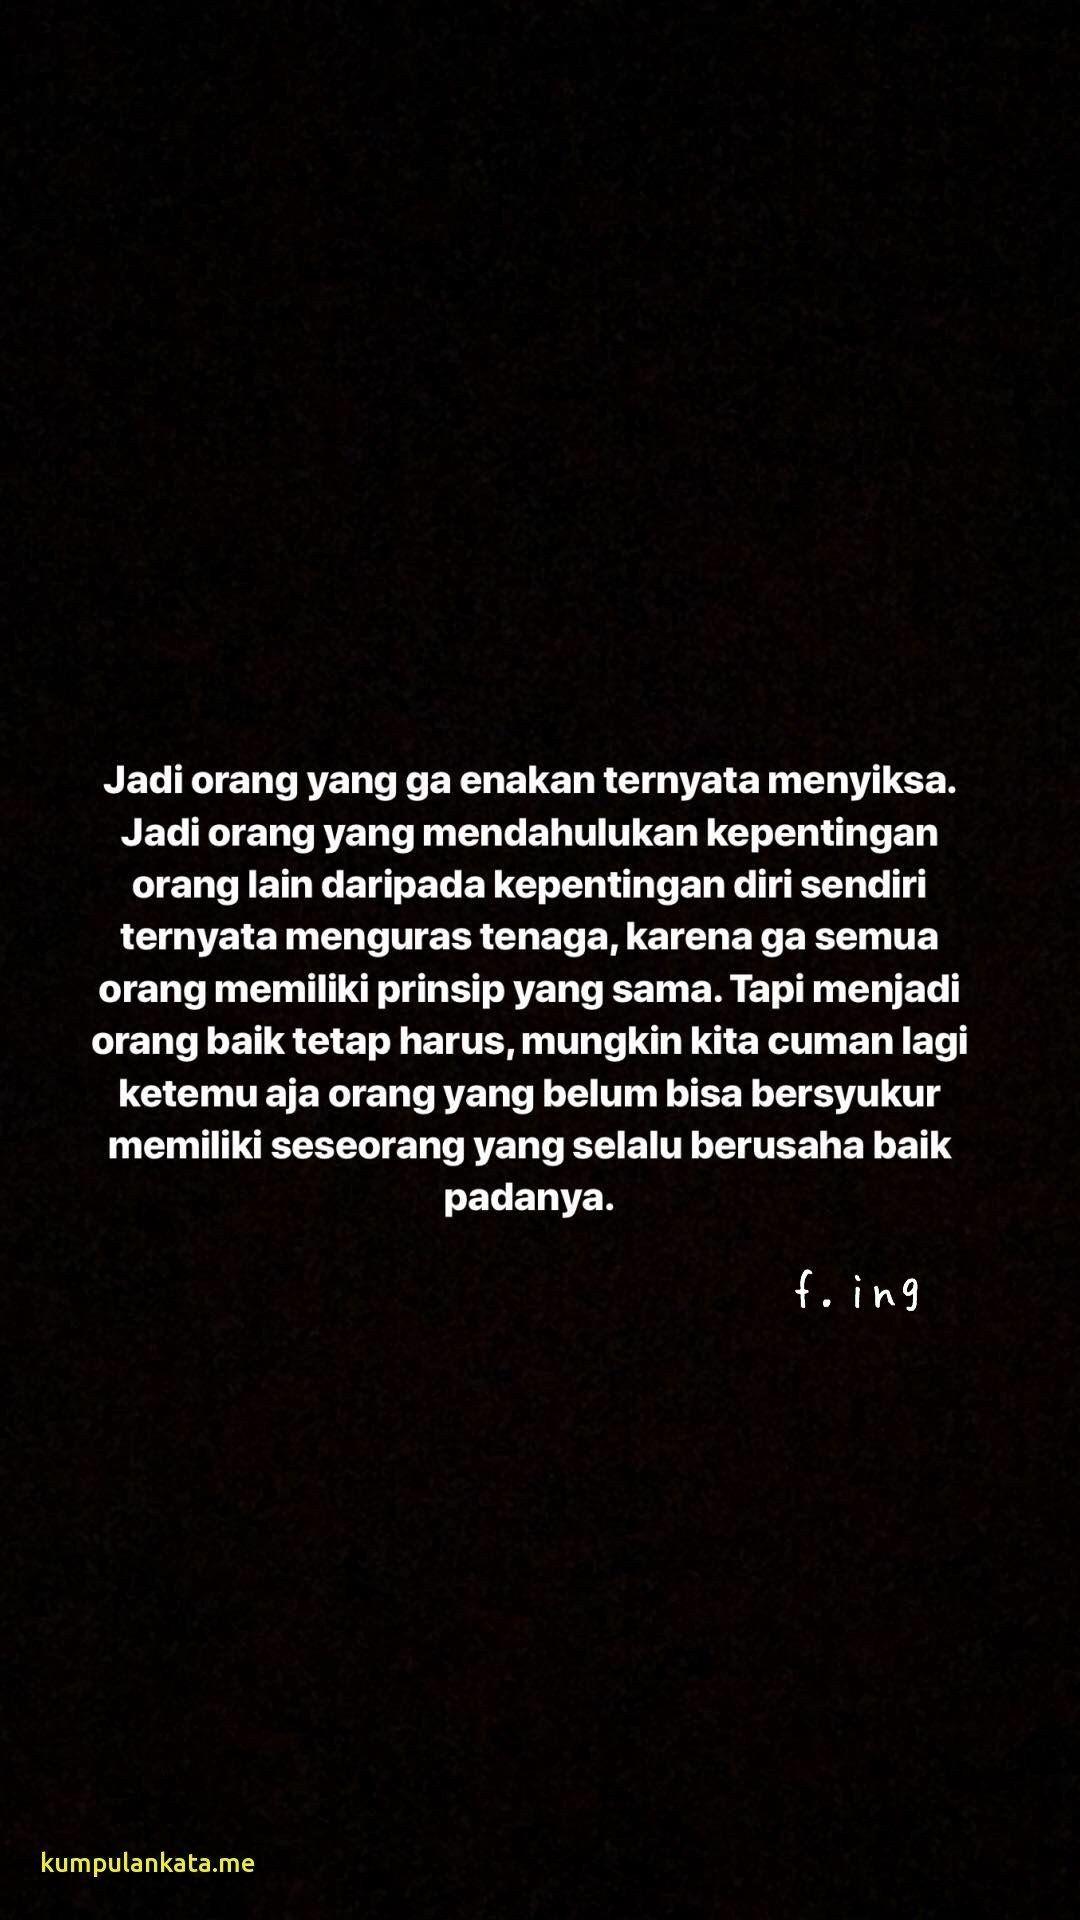 Quotes indonesia Ikuti Instagram erickanadi untuk